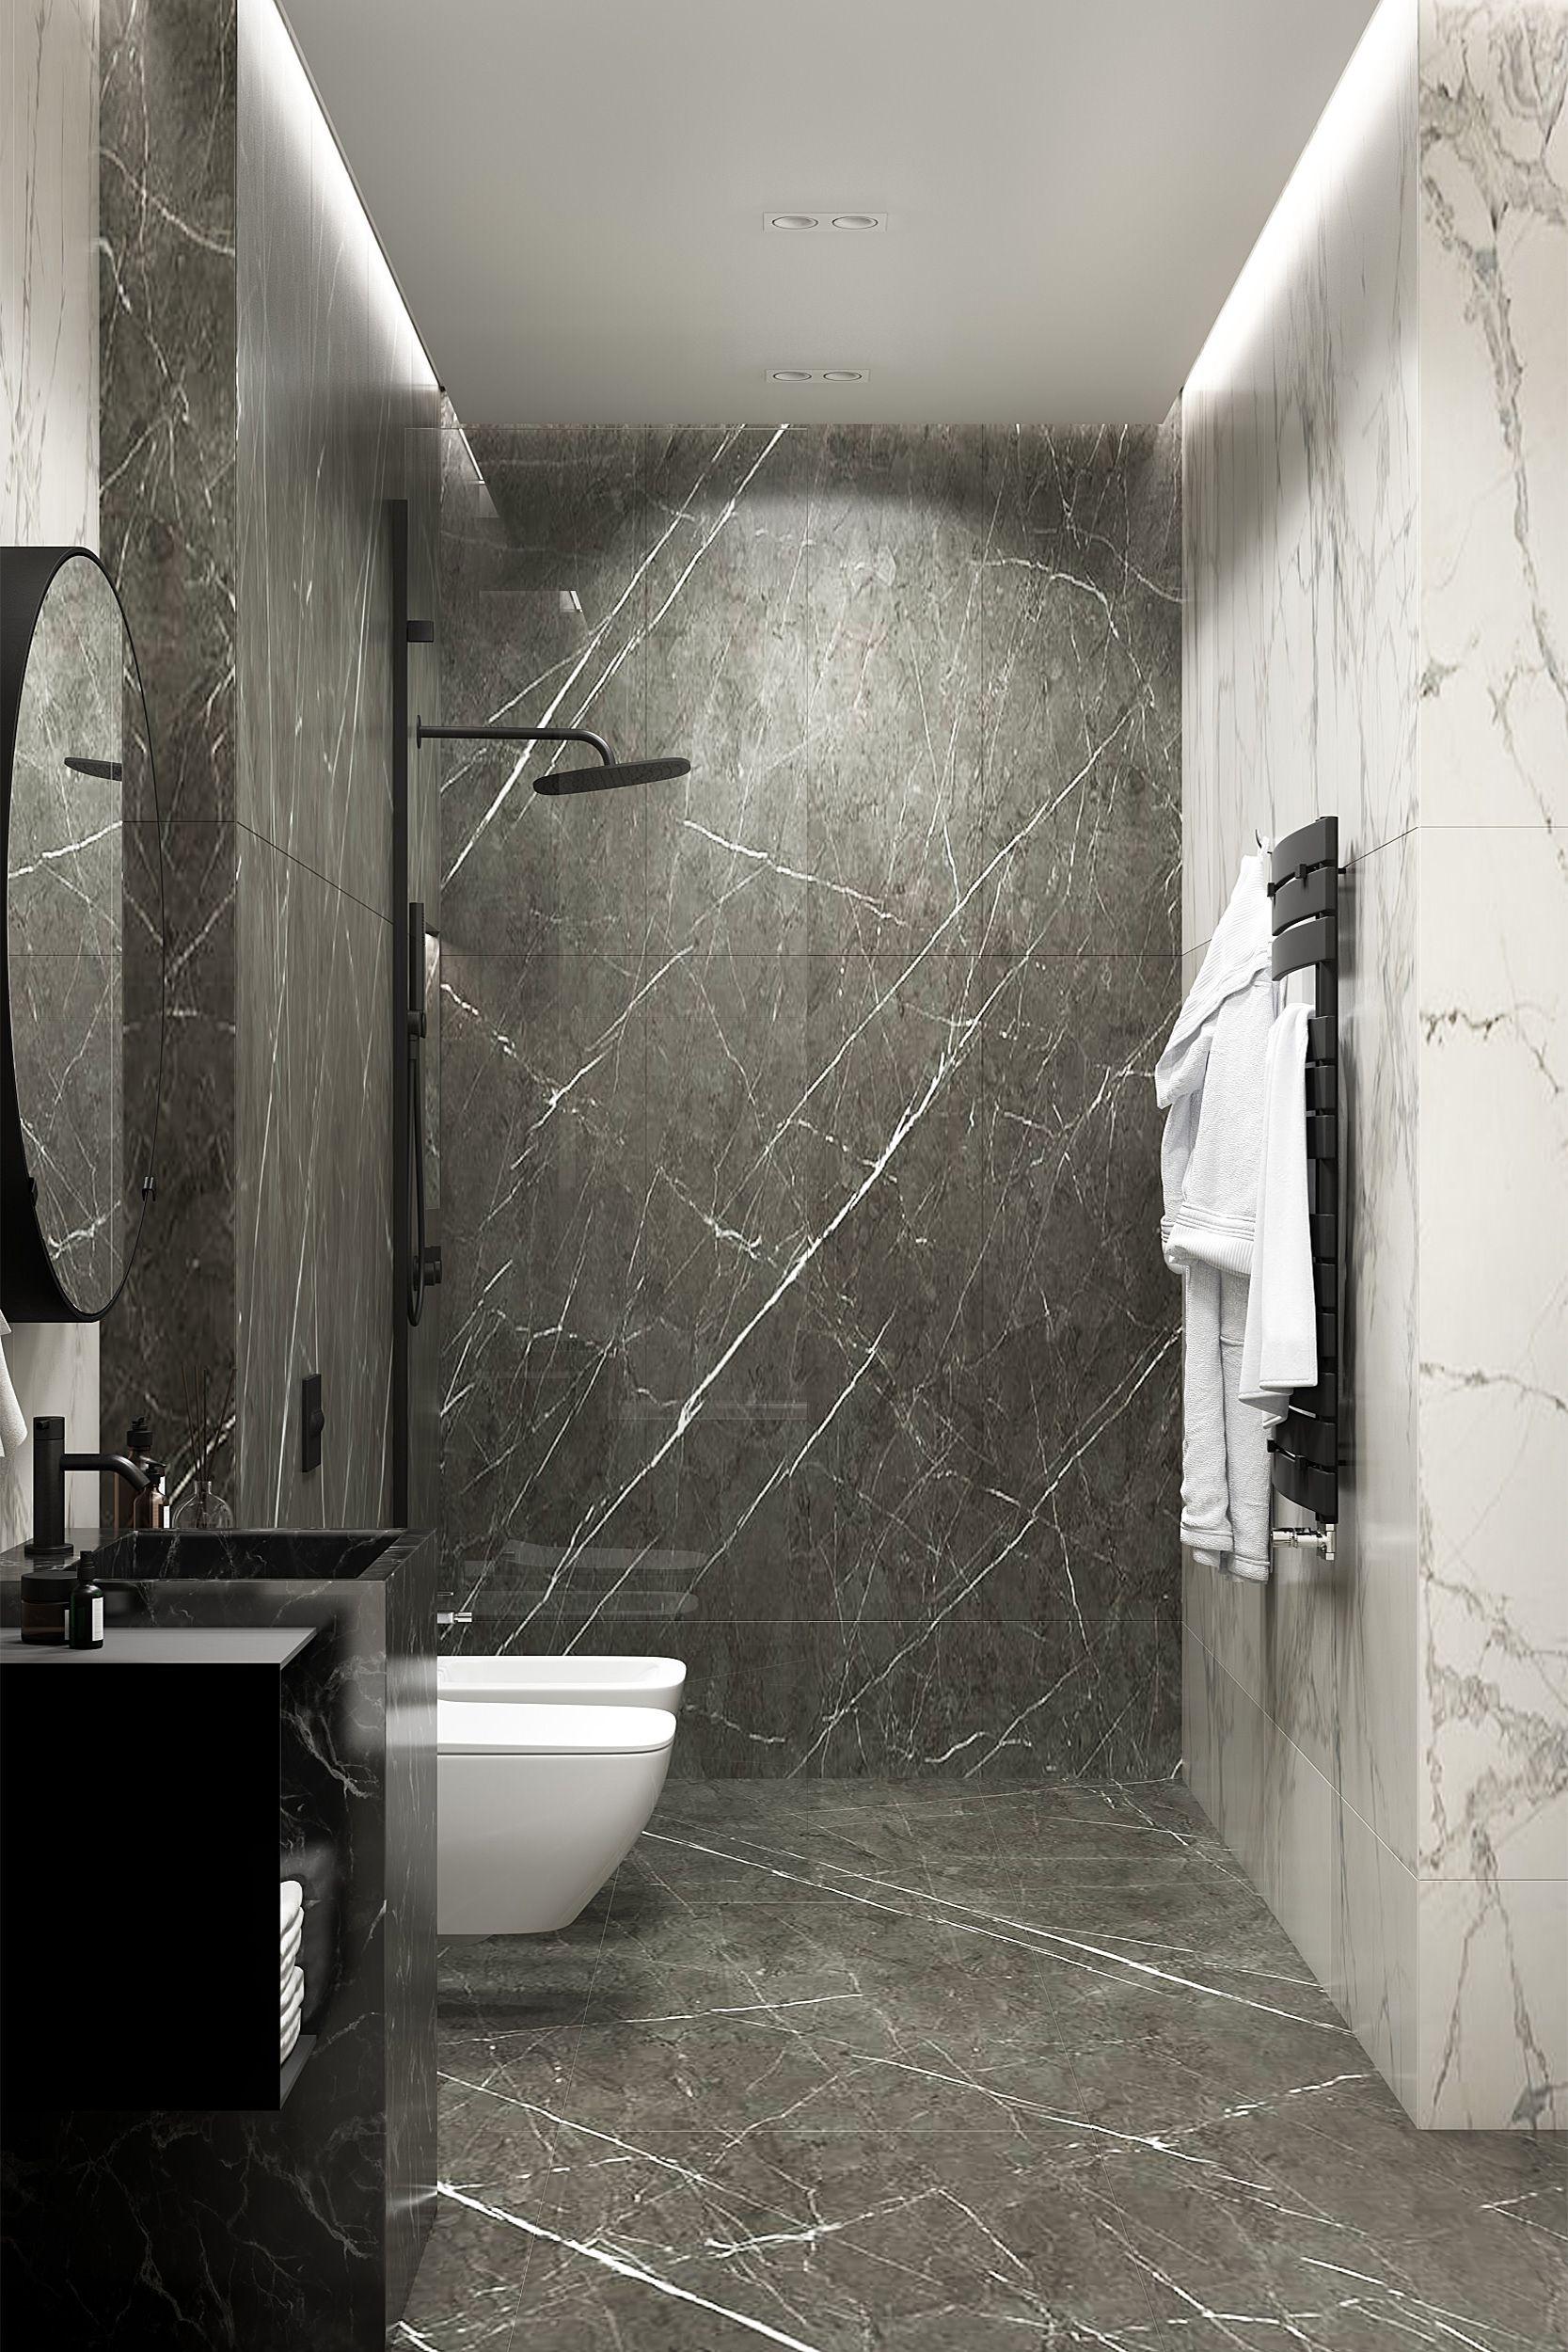 Pin By Filip Ingemarson On Bathroom Ideas Black Marble Bathroom Grey Marble Bathroom Marble Bathroom Designs